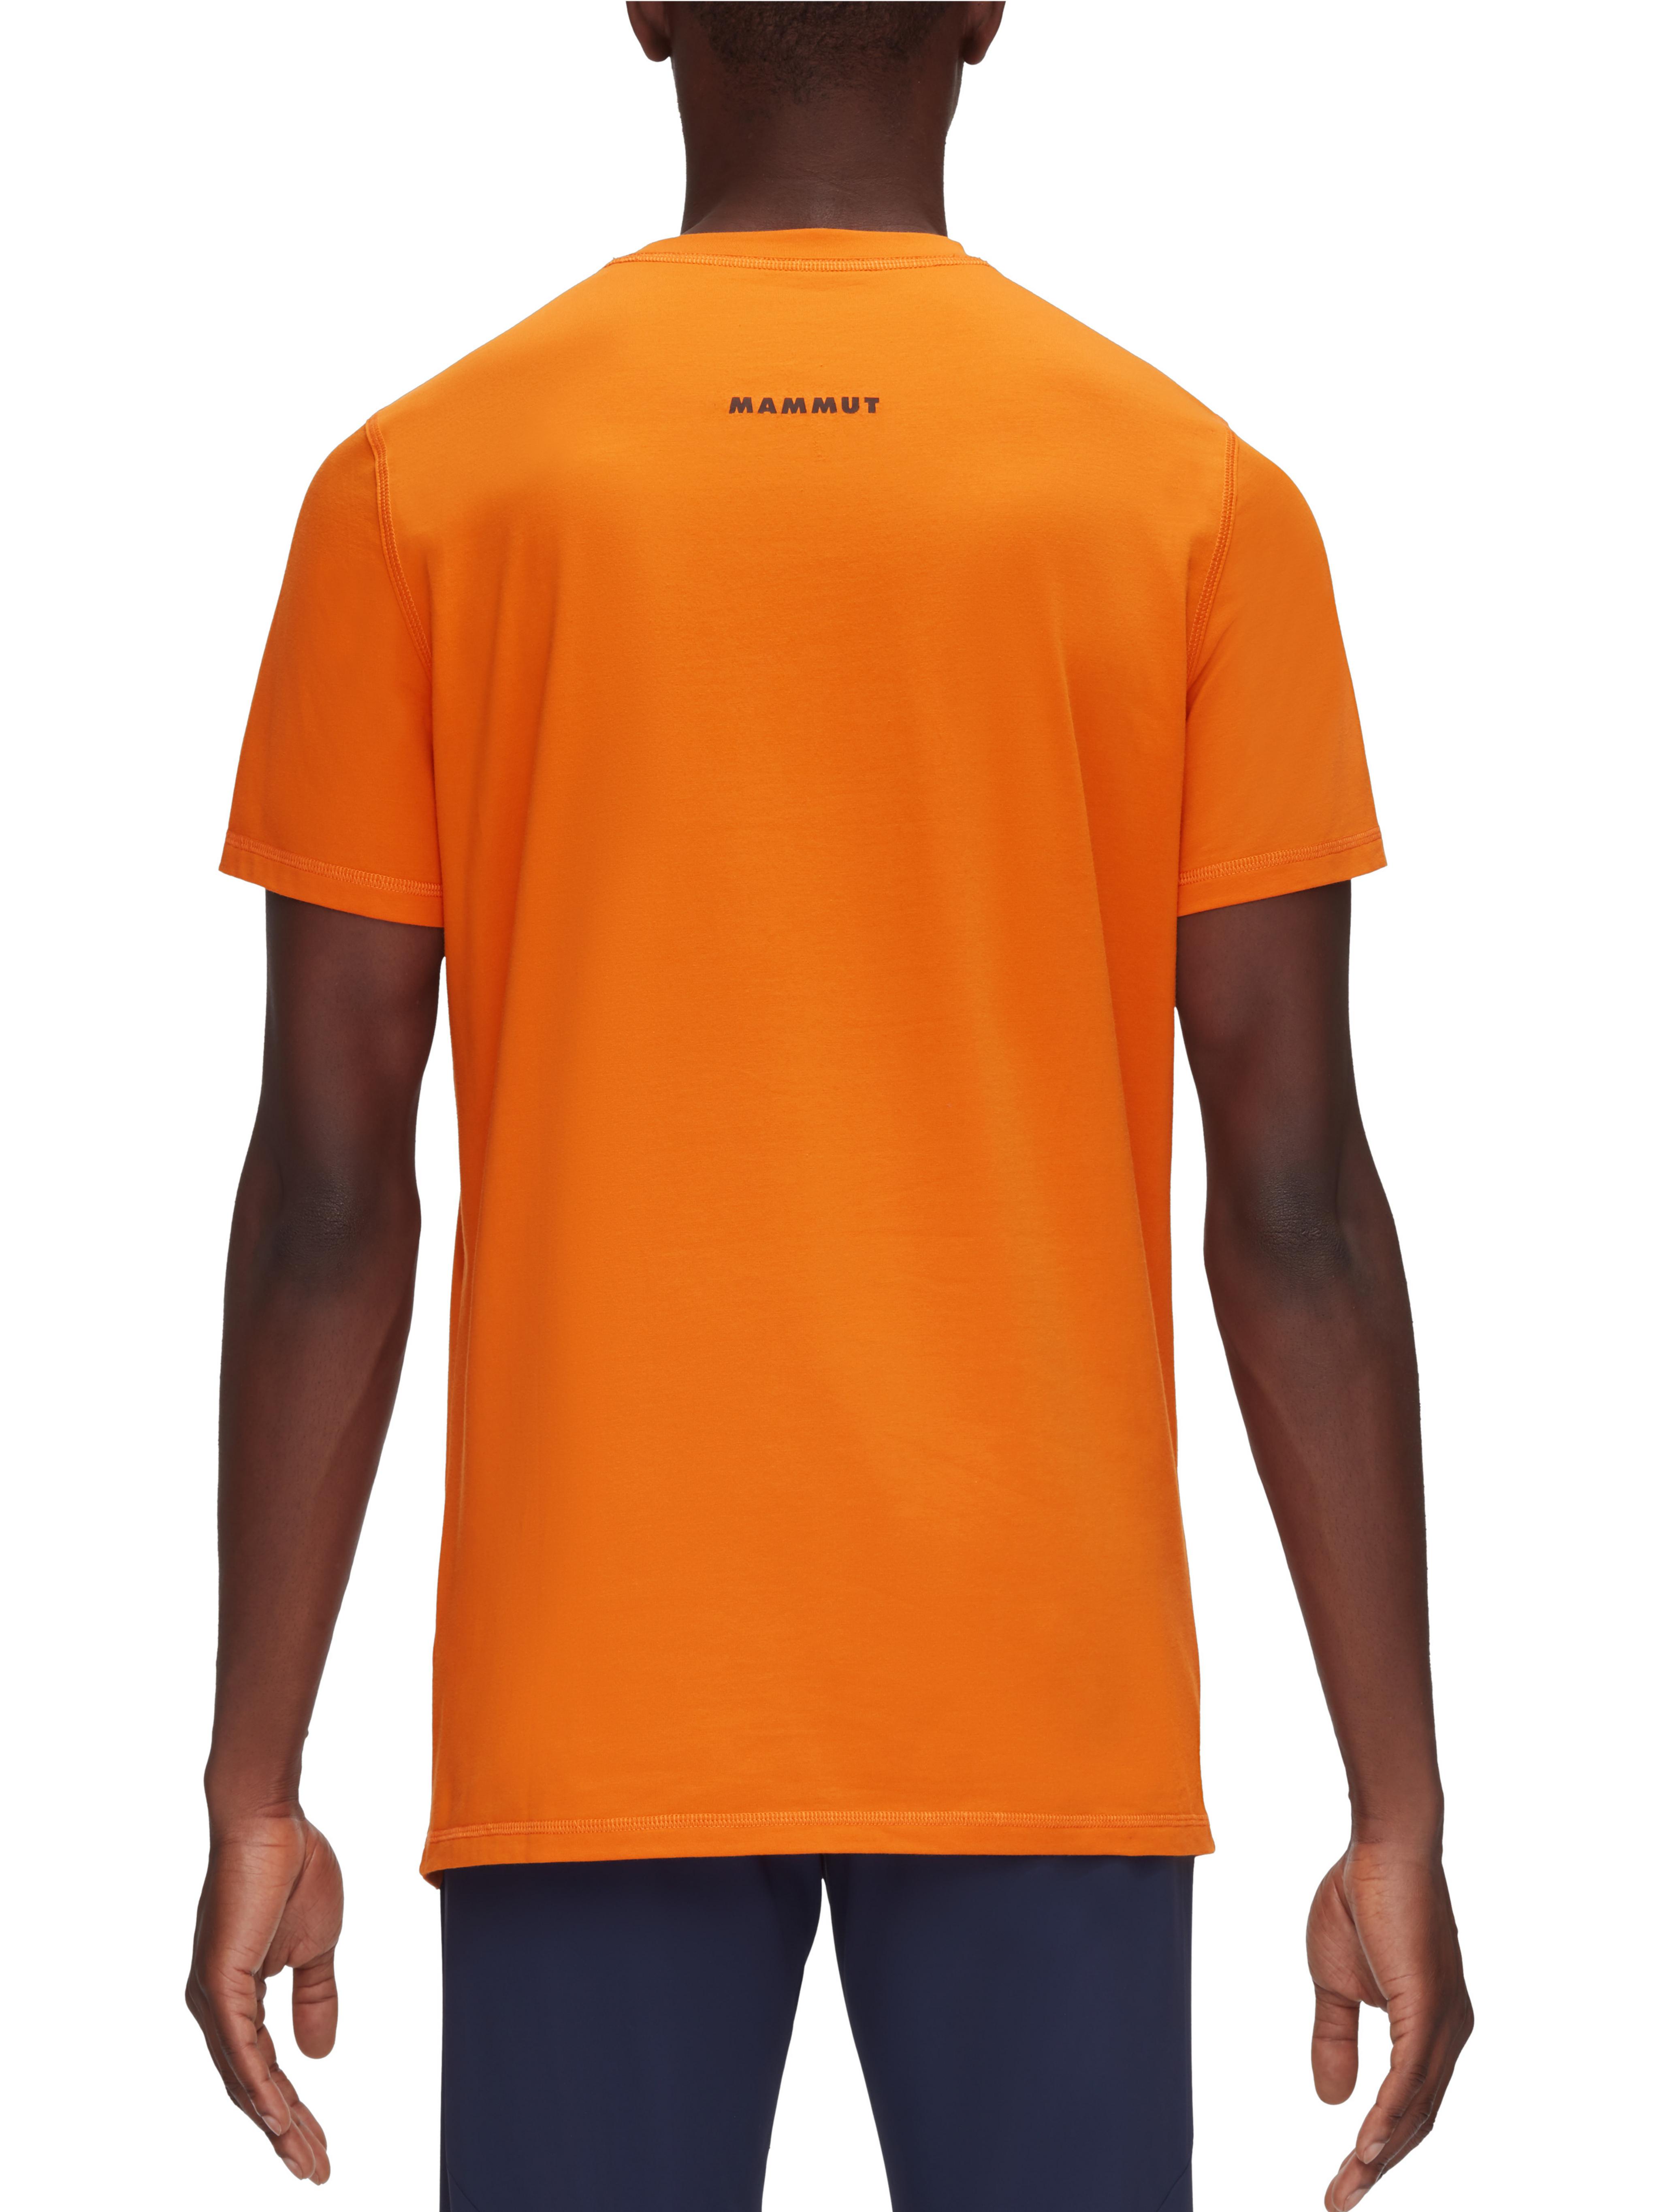 Mammut Graphic T-Shirt Men image